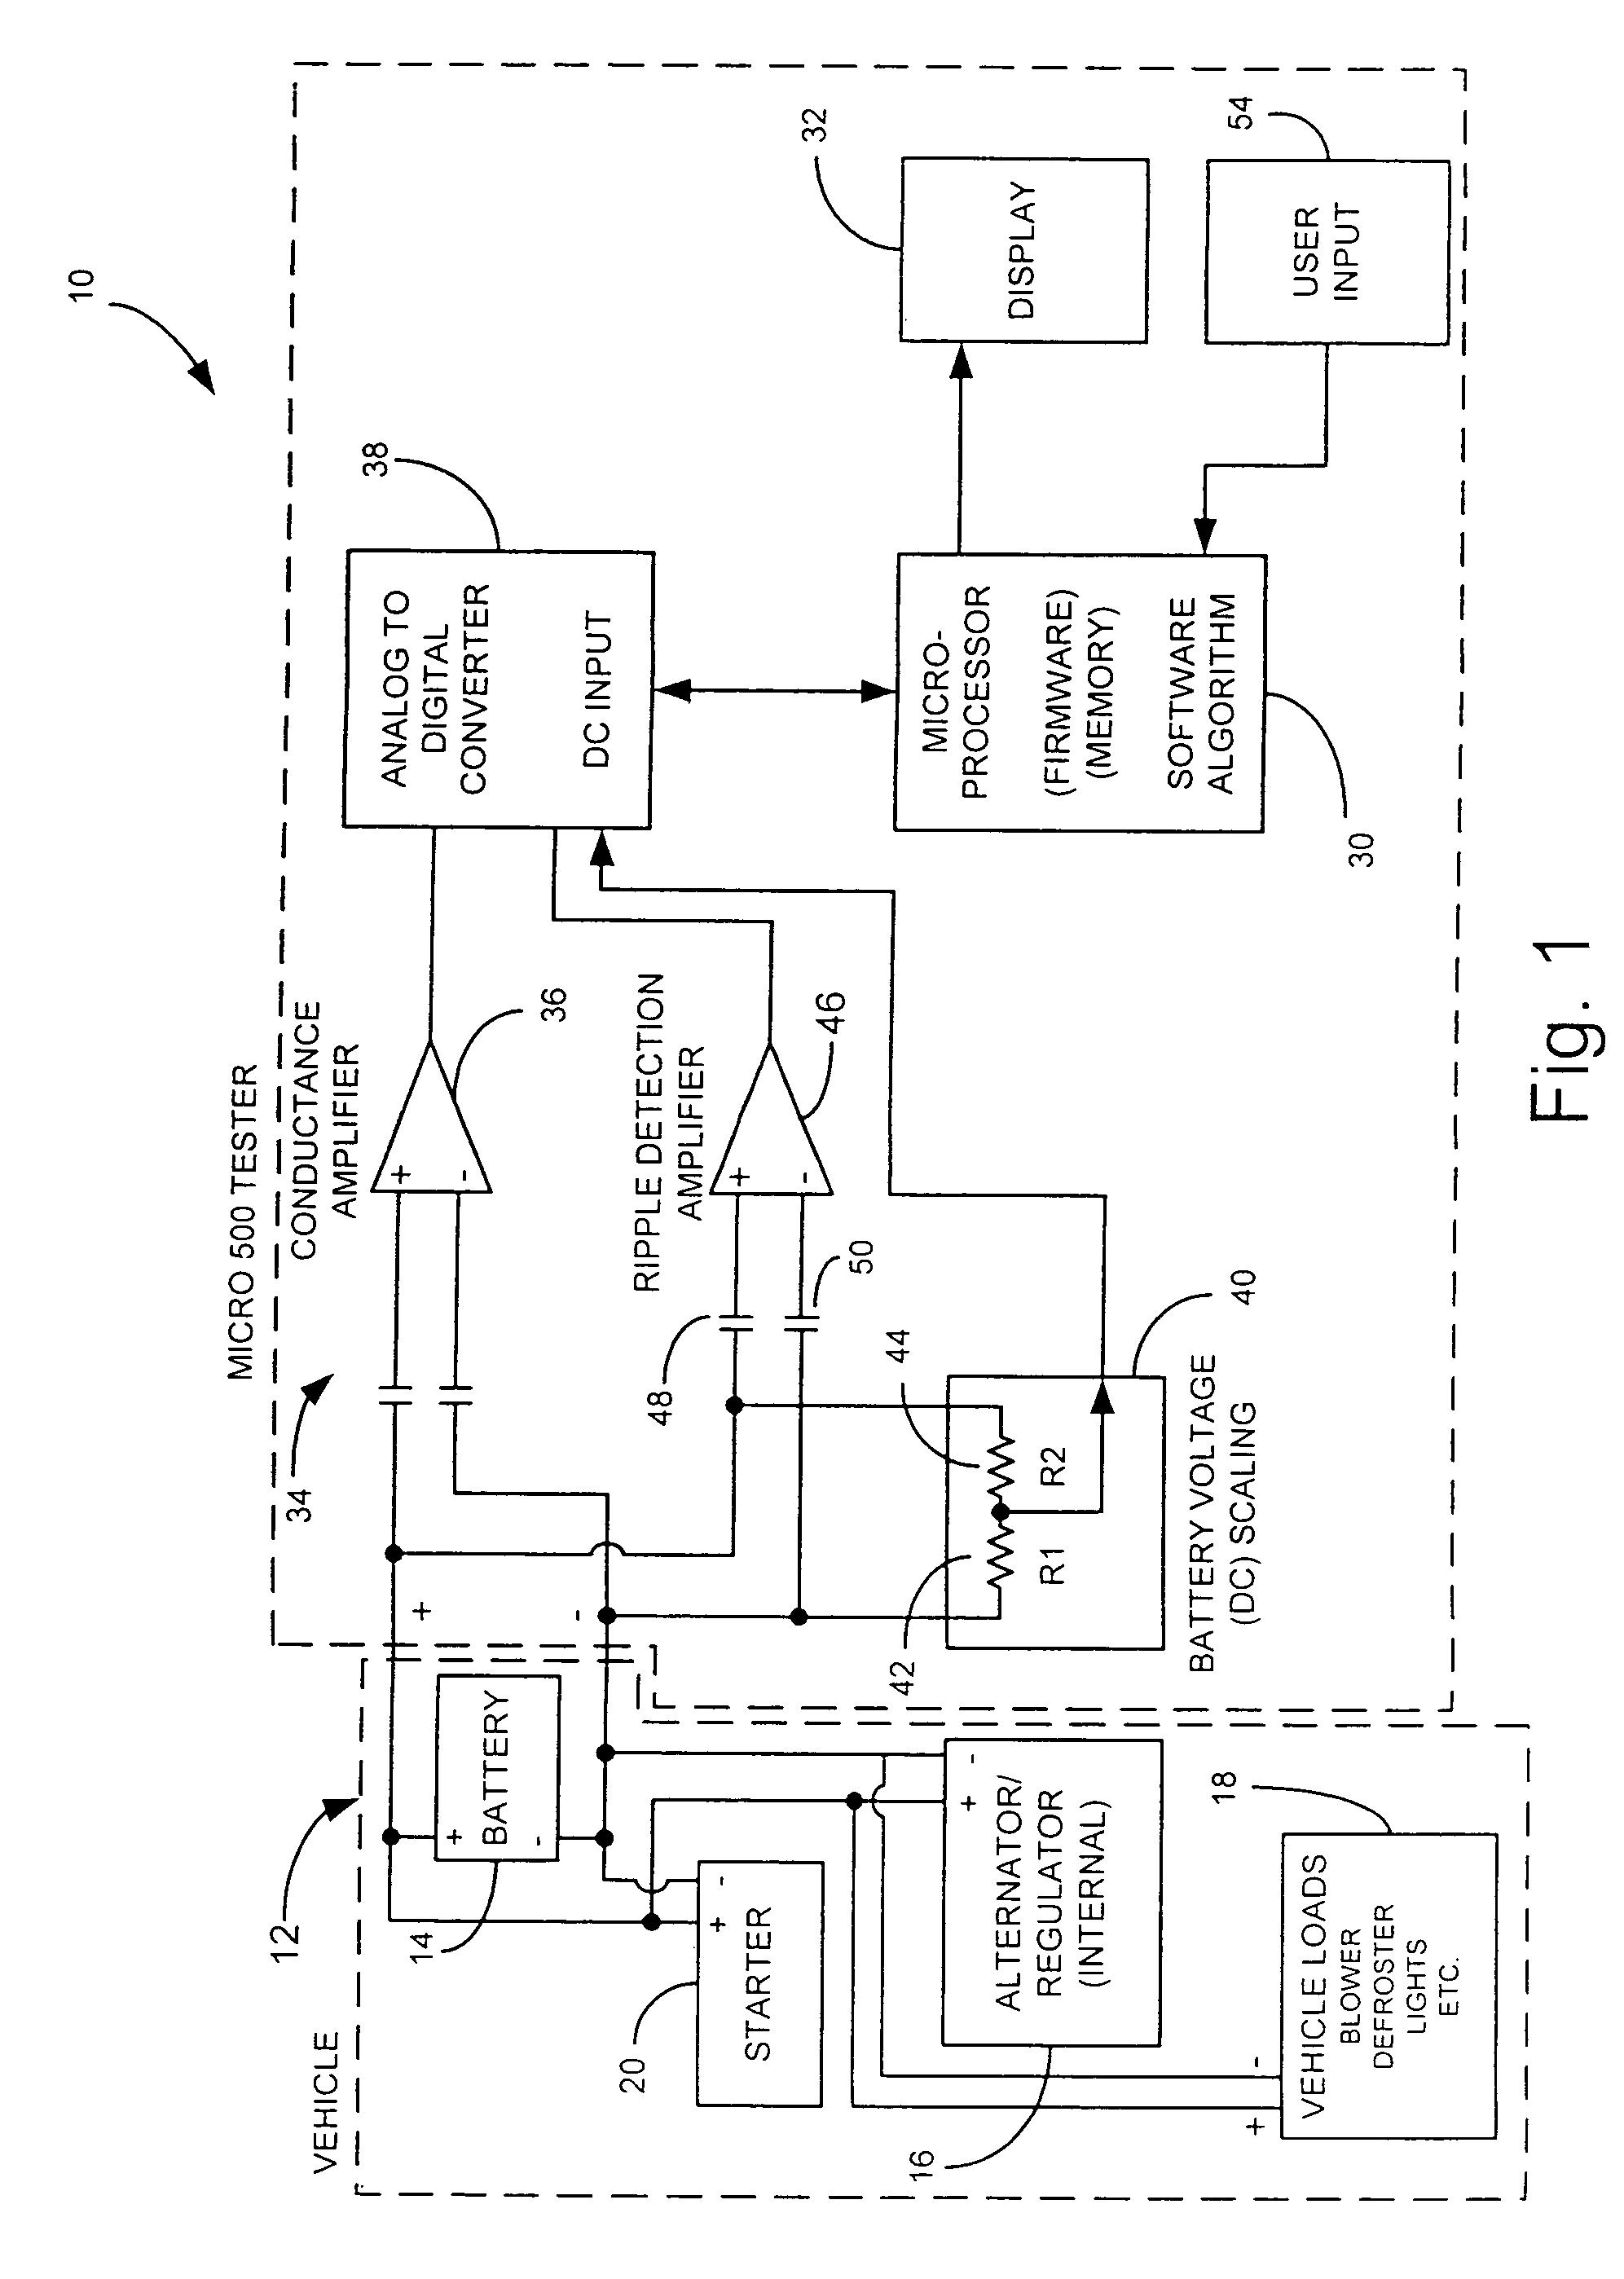 Patent US 8,198,900 B2